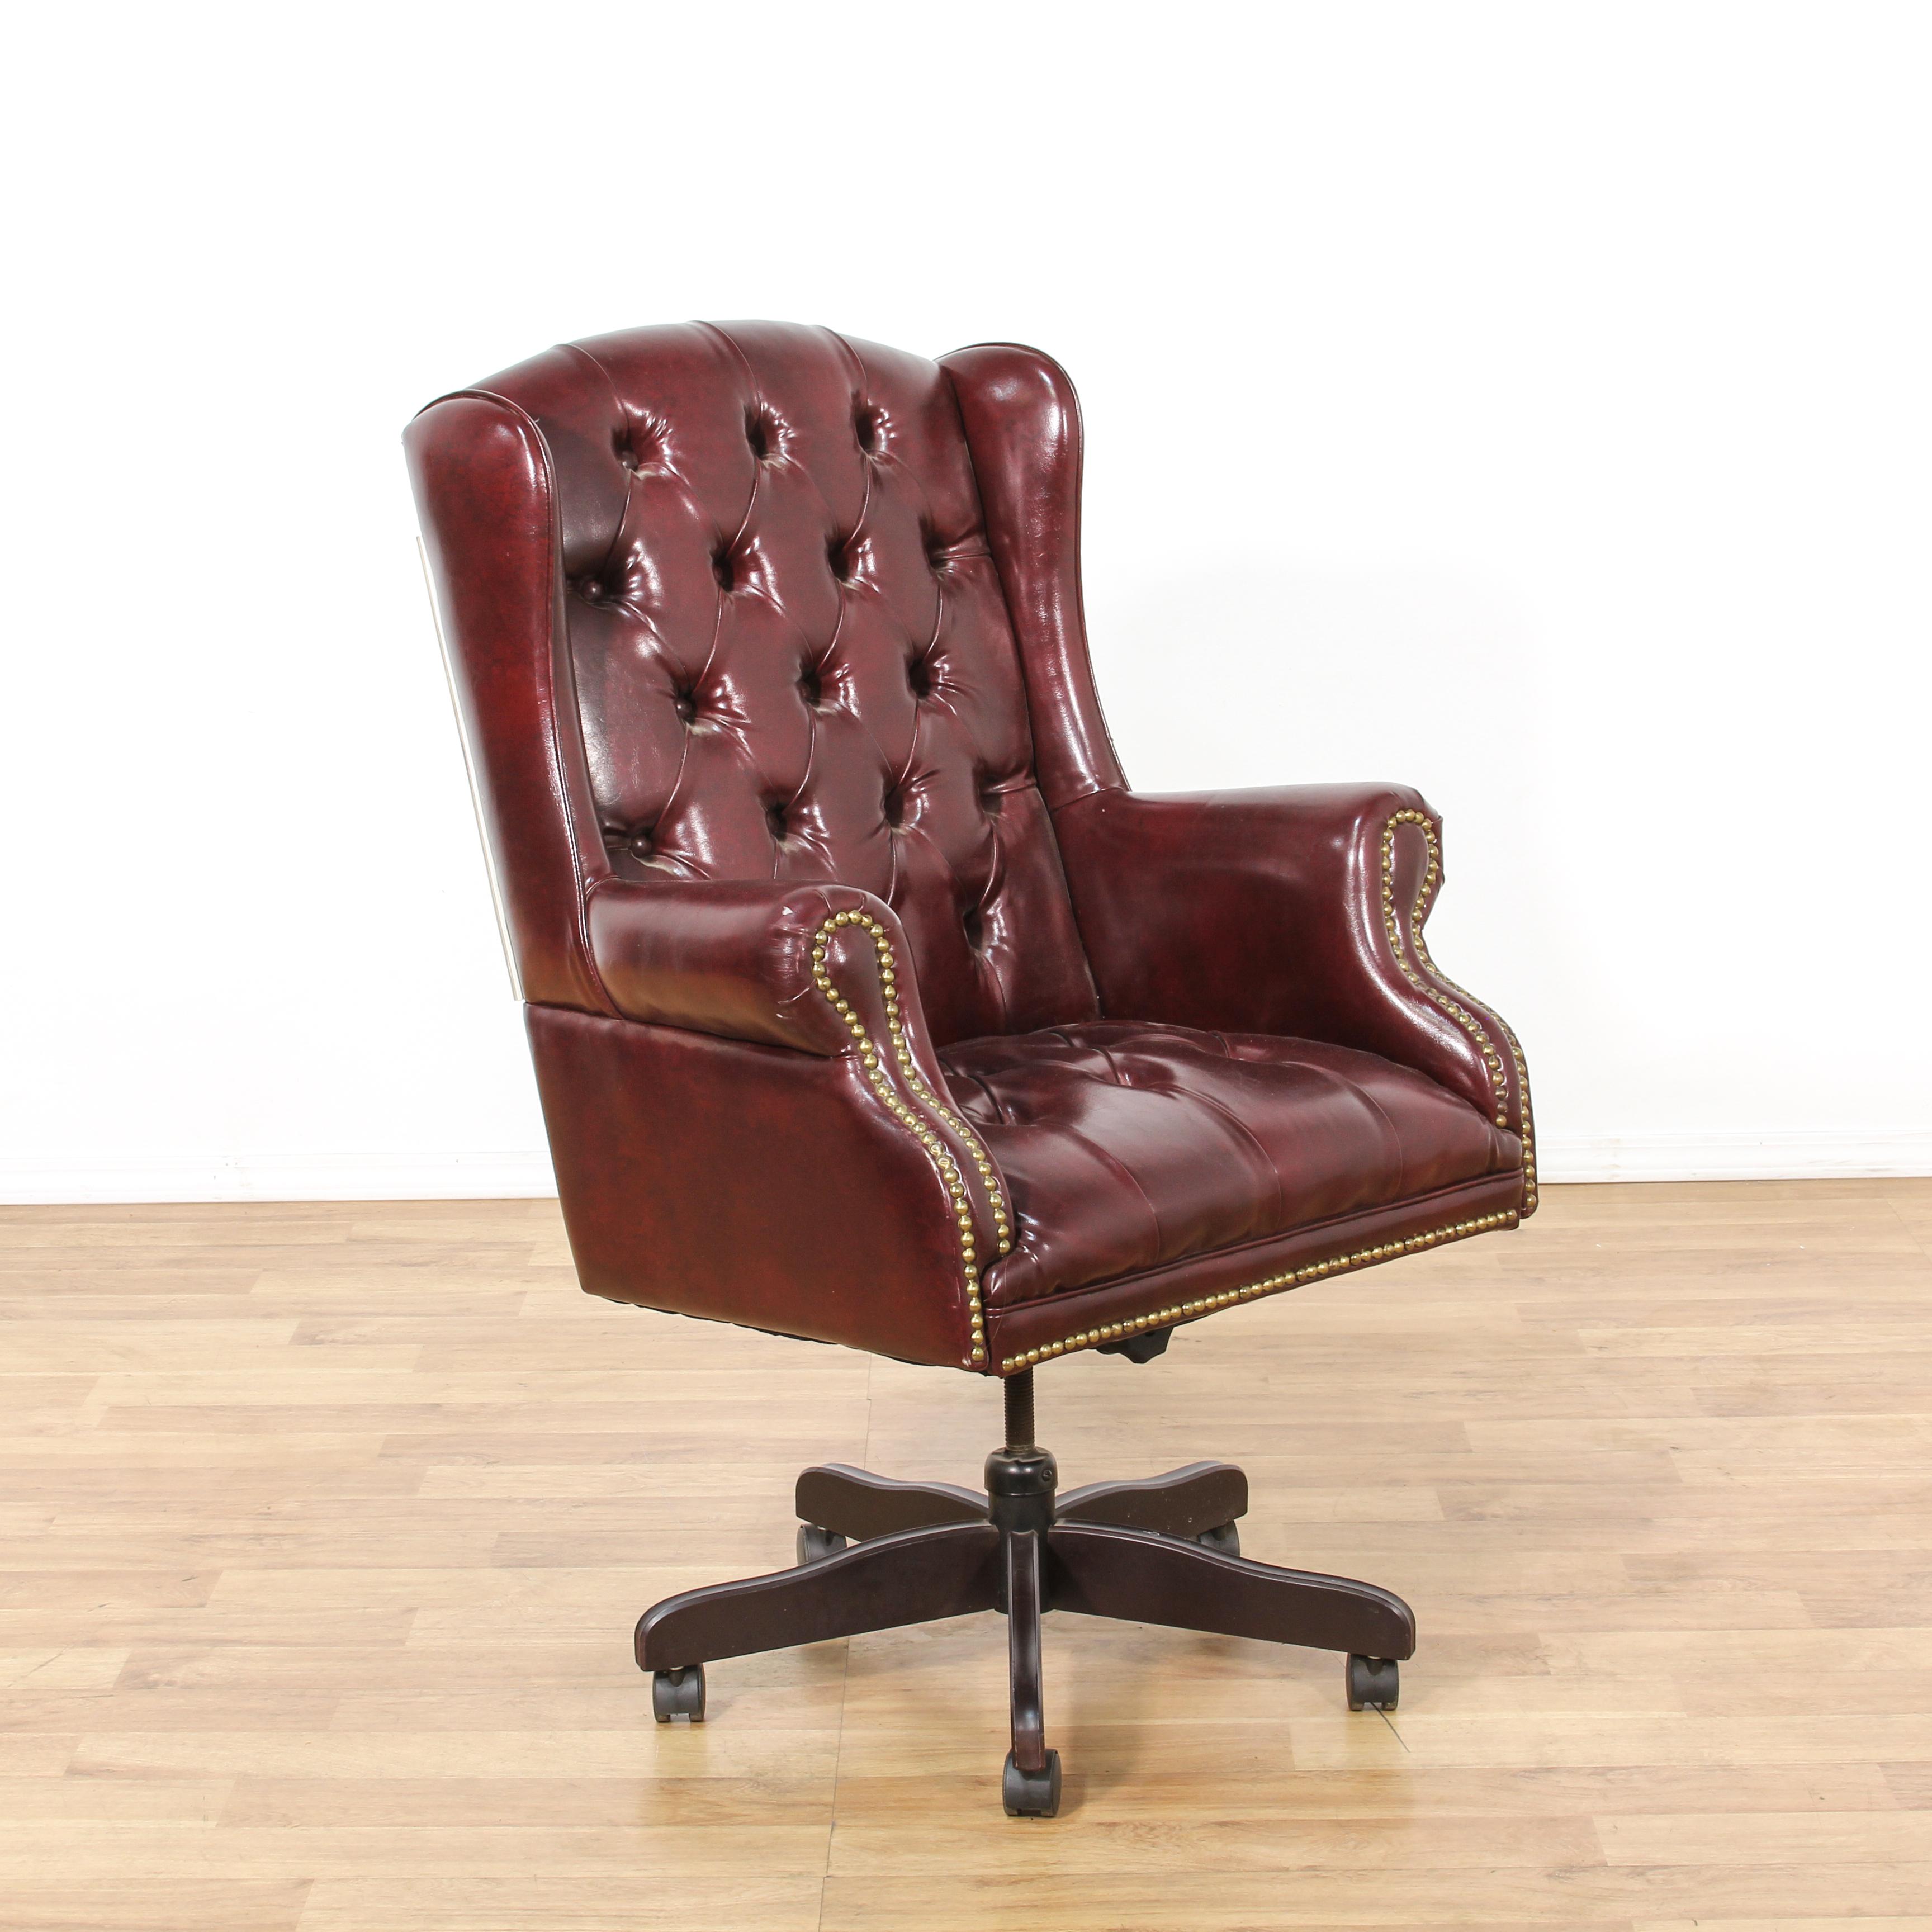 swivel chair office warehouse harter steel sturgis michigan purple leather tufted executive | loveseat vintage furniture san diego & los angeles